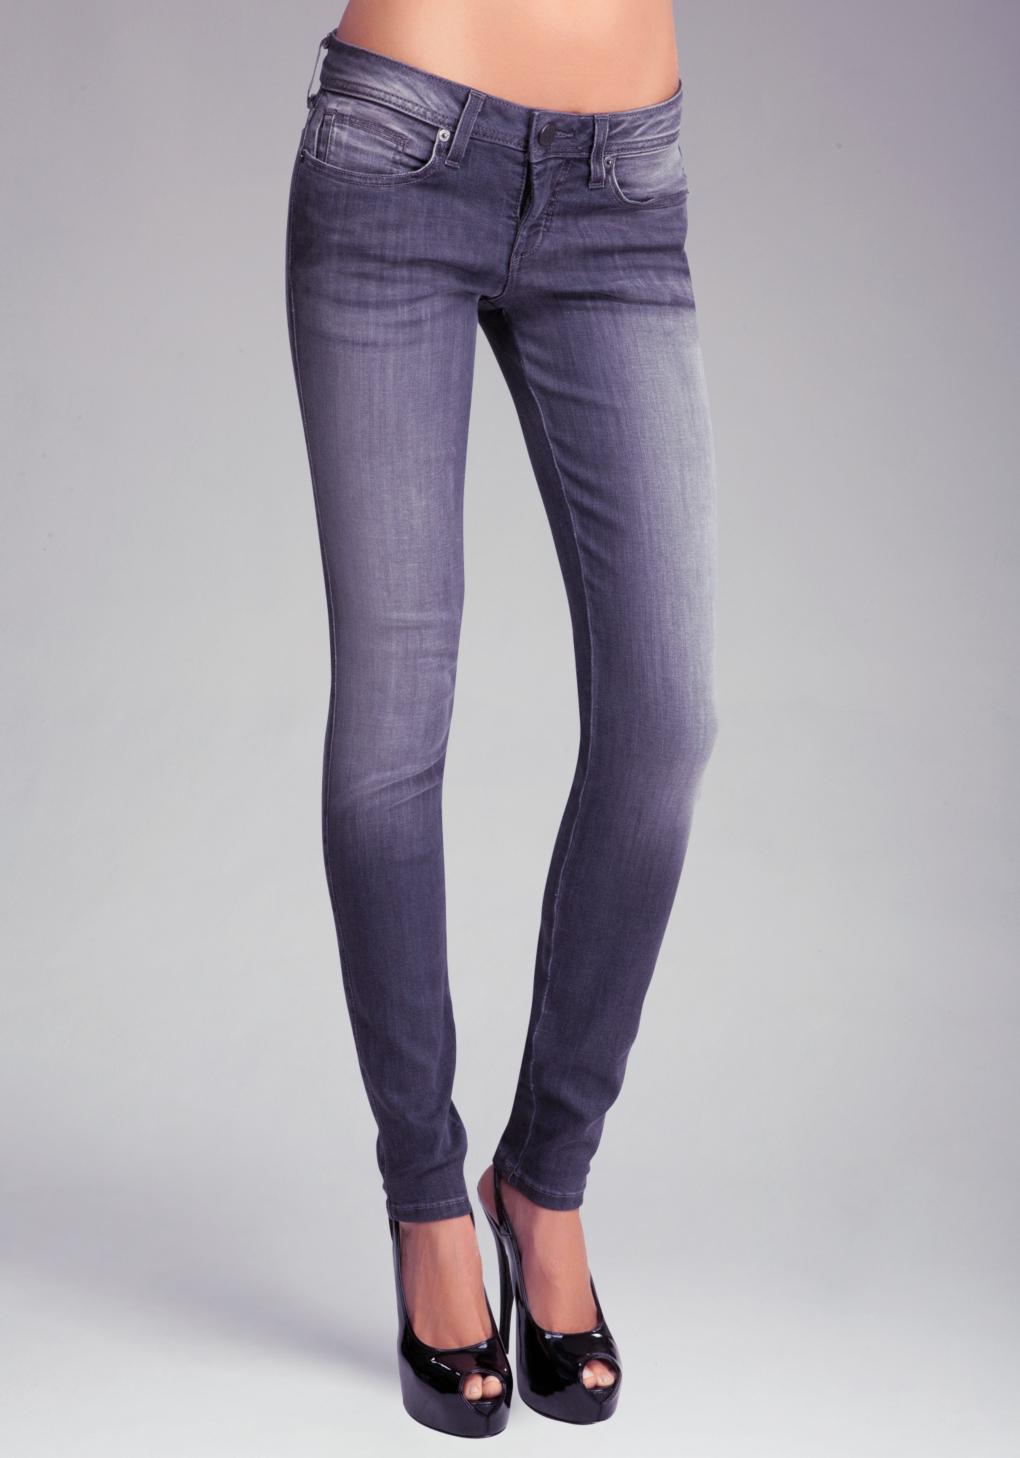 Bebe Signature Stretch Skinny Jean In Gray Lyst